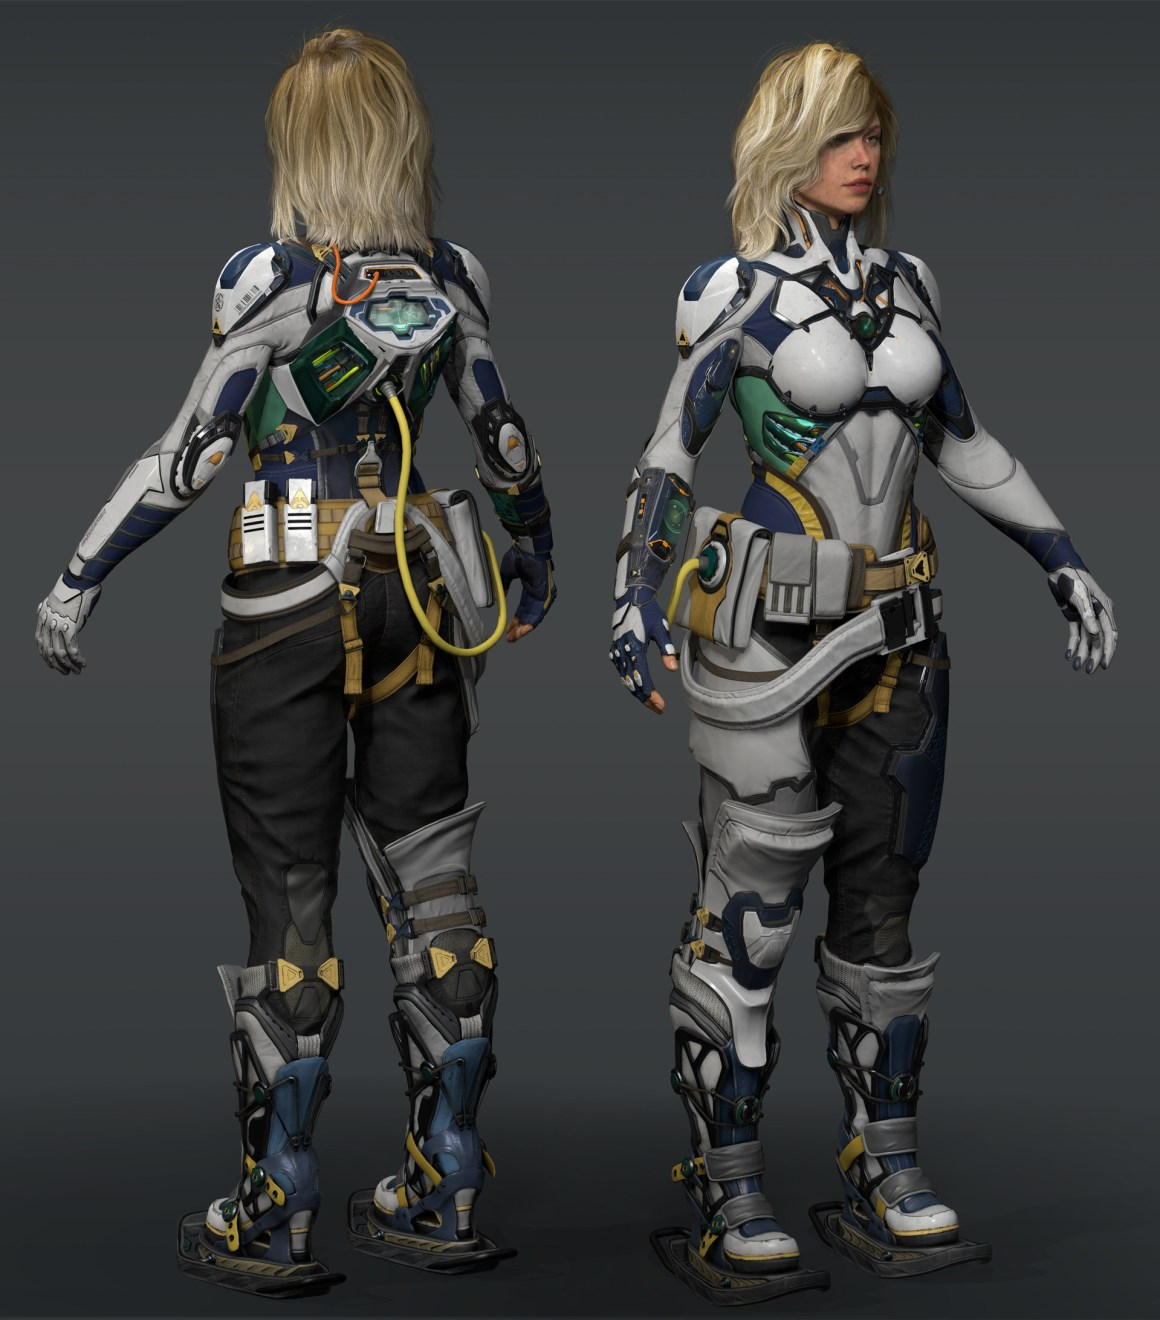 MRZ Exploration Soldier by Adale Rene